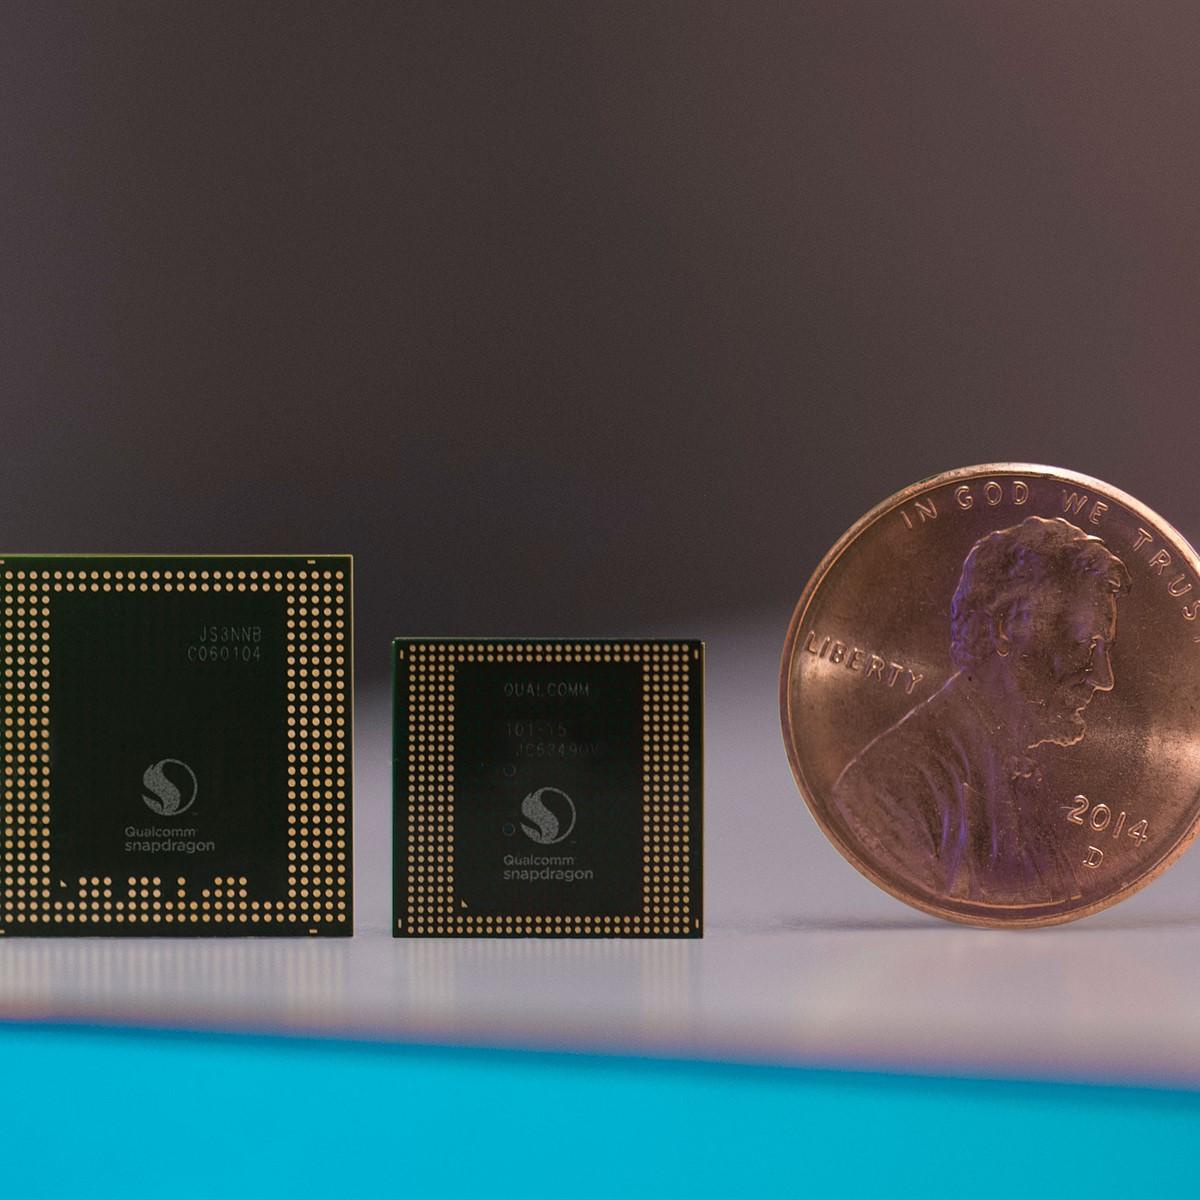 Qualcomm announces Snapdragon 835 with enhanced camera